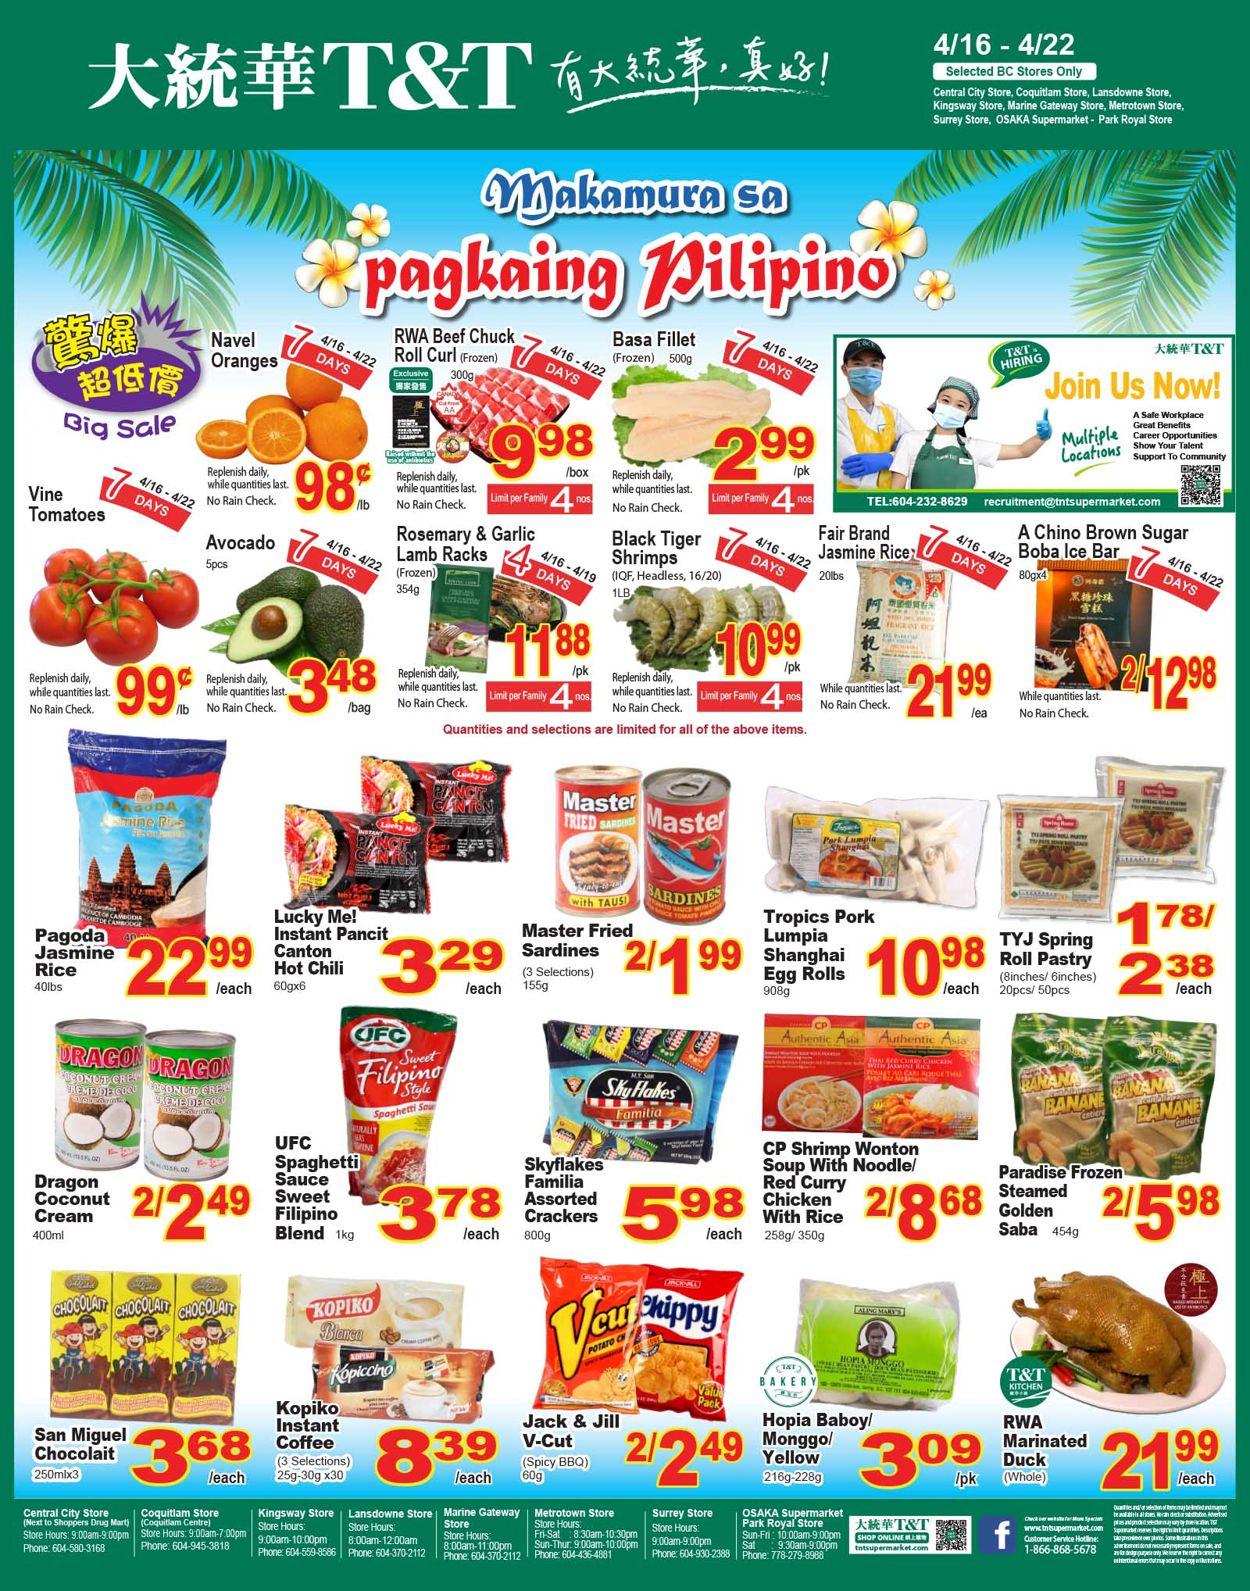 T&T Supermarket - British Columbia Flyer - 04/16-04/22/2021 (Page 4)